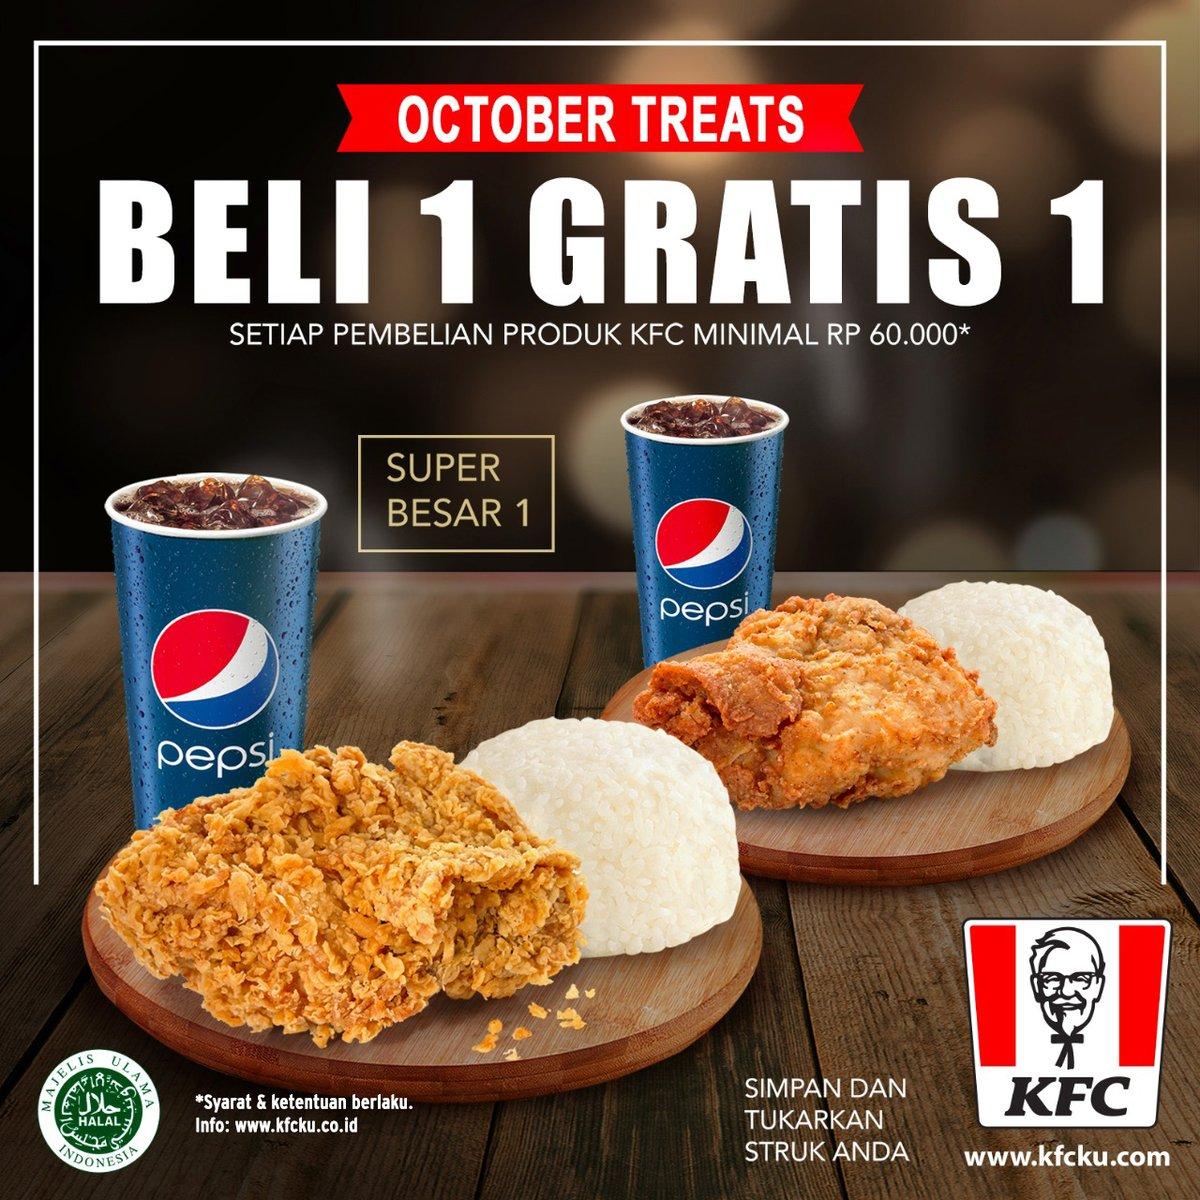 KFC - Promo Beli 1 Gratis 1 Belanja min 60 Ribu (s.d 31 Okt 2018)